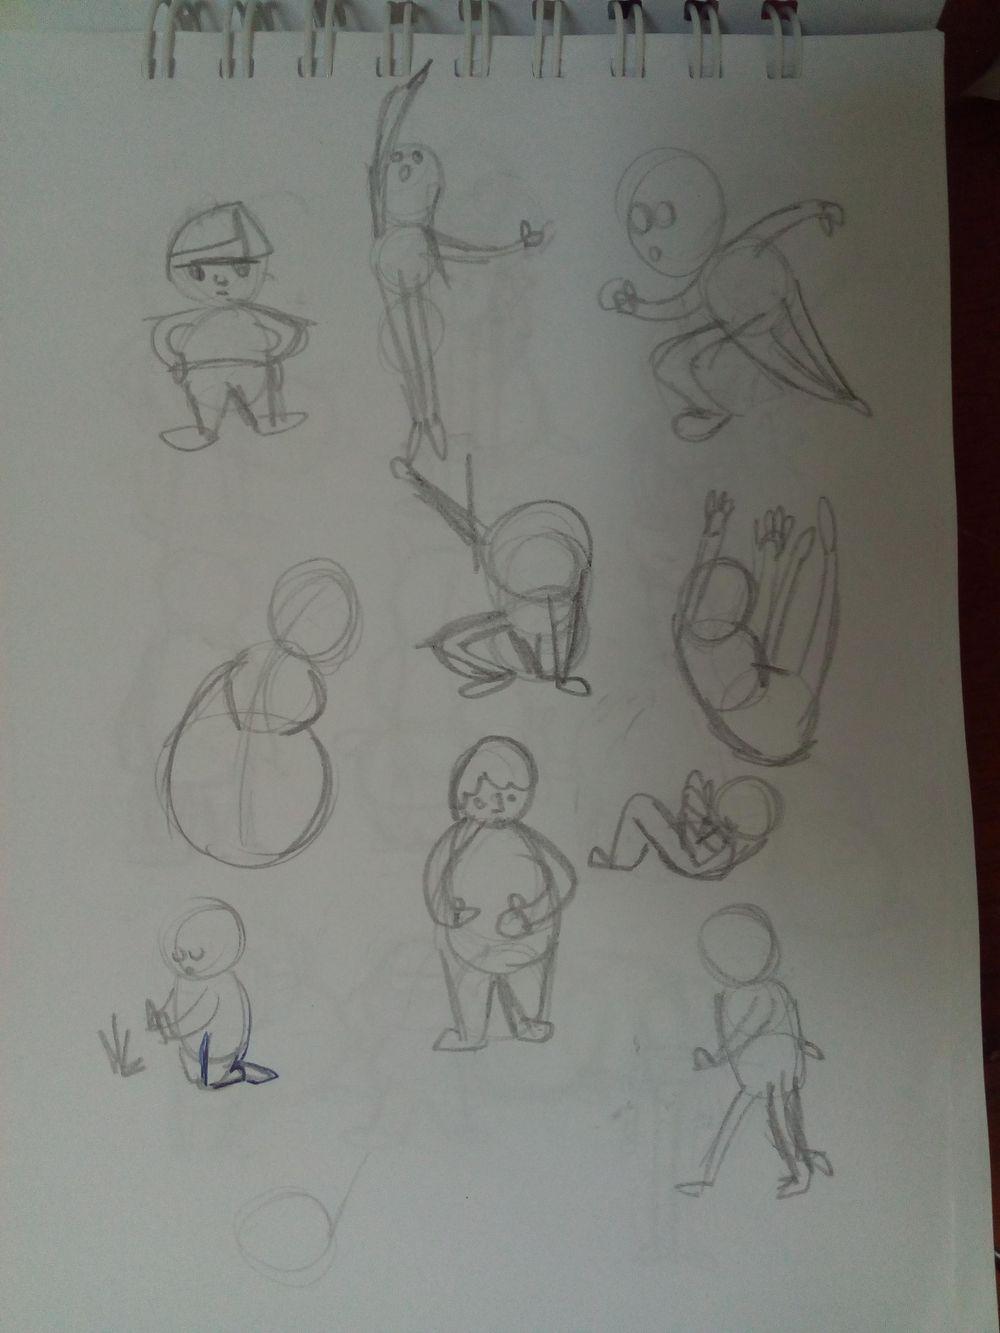 Class project Juanca - image 3 - student project